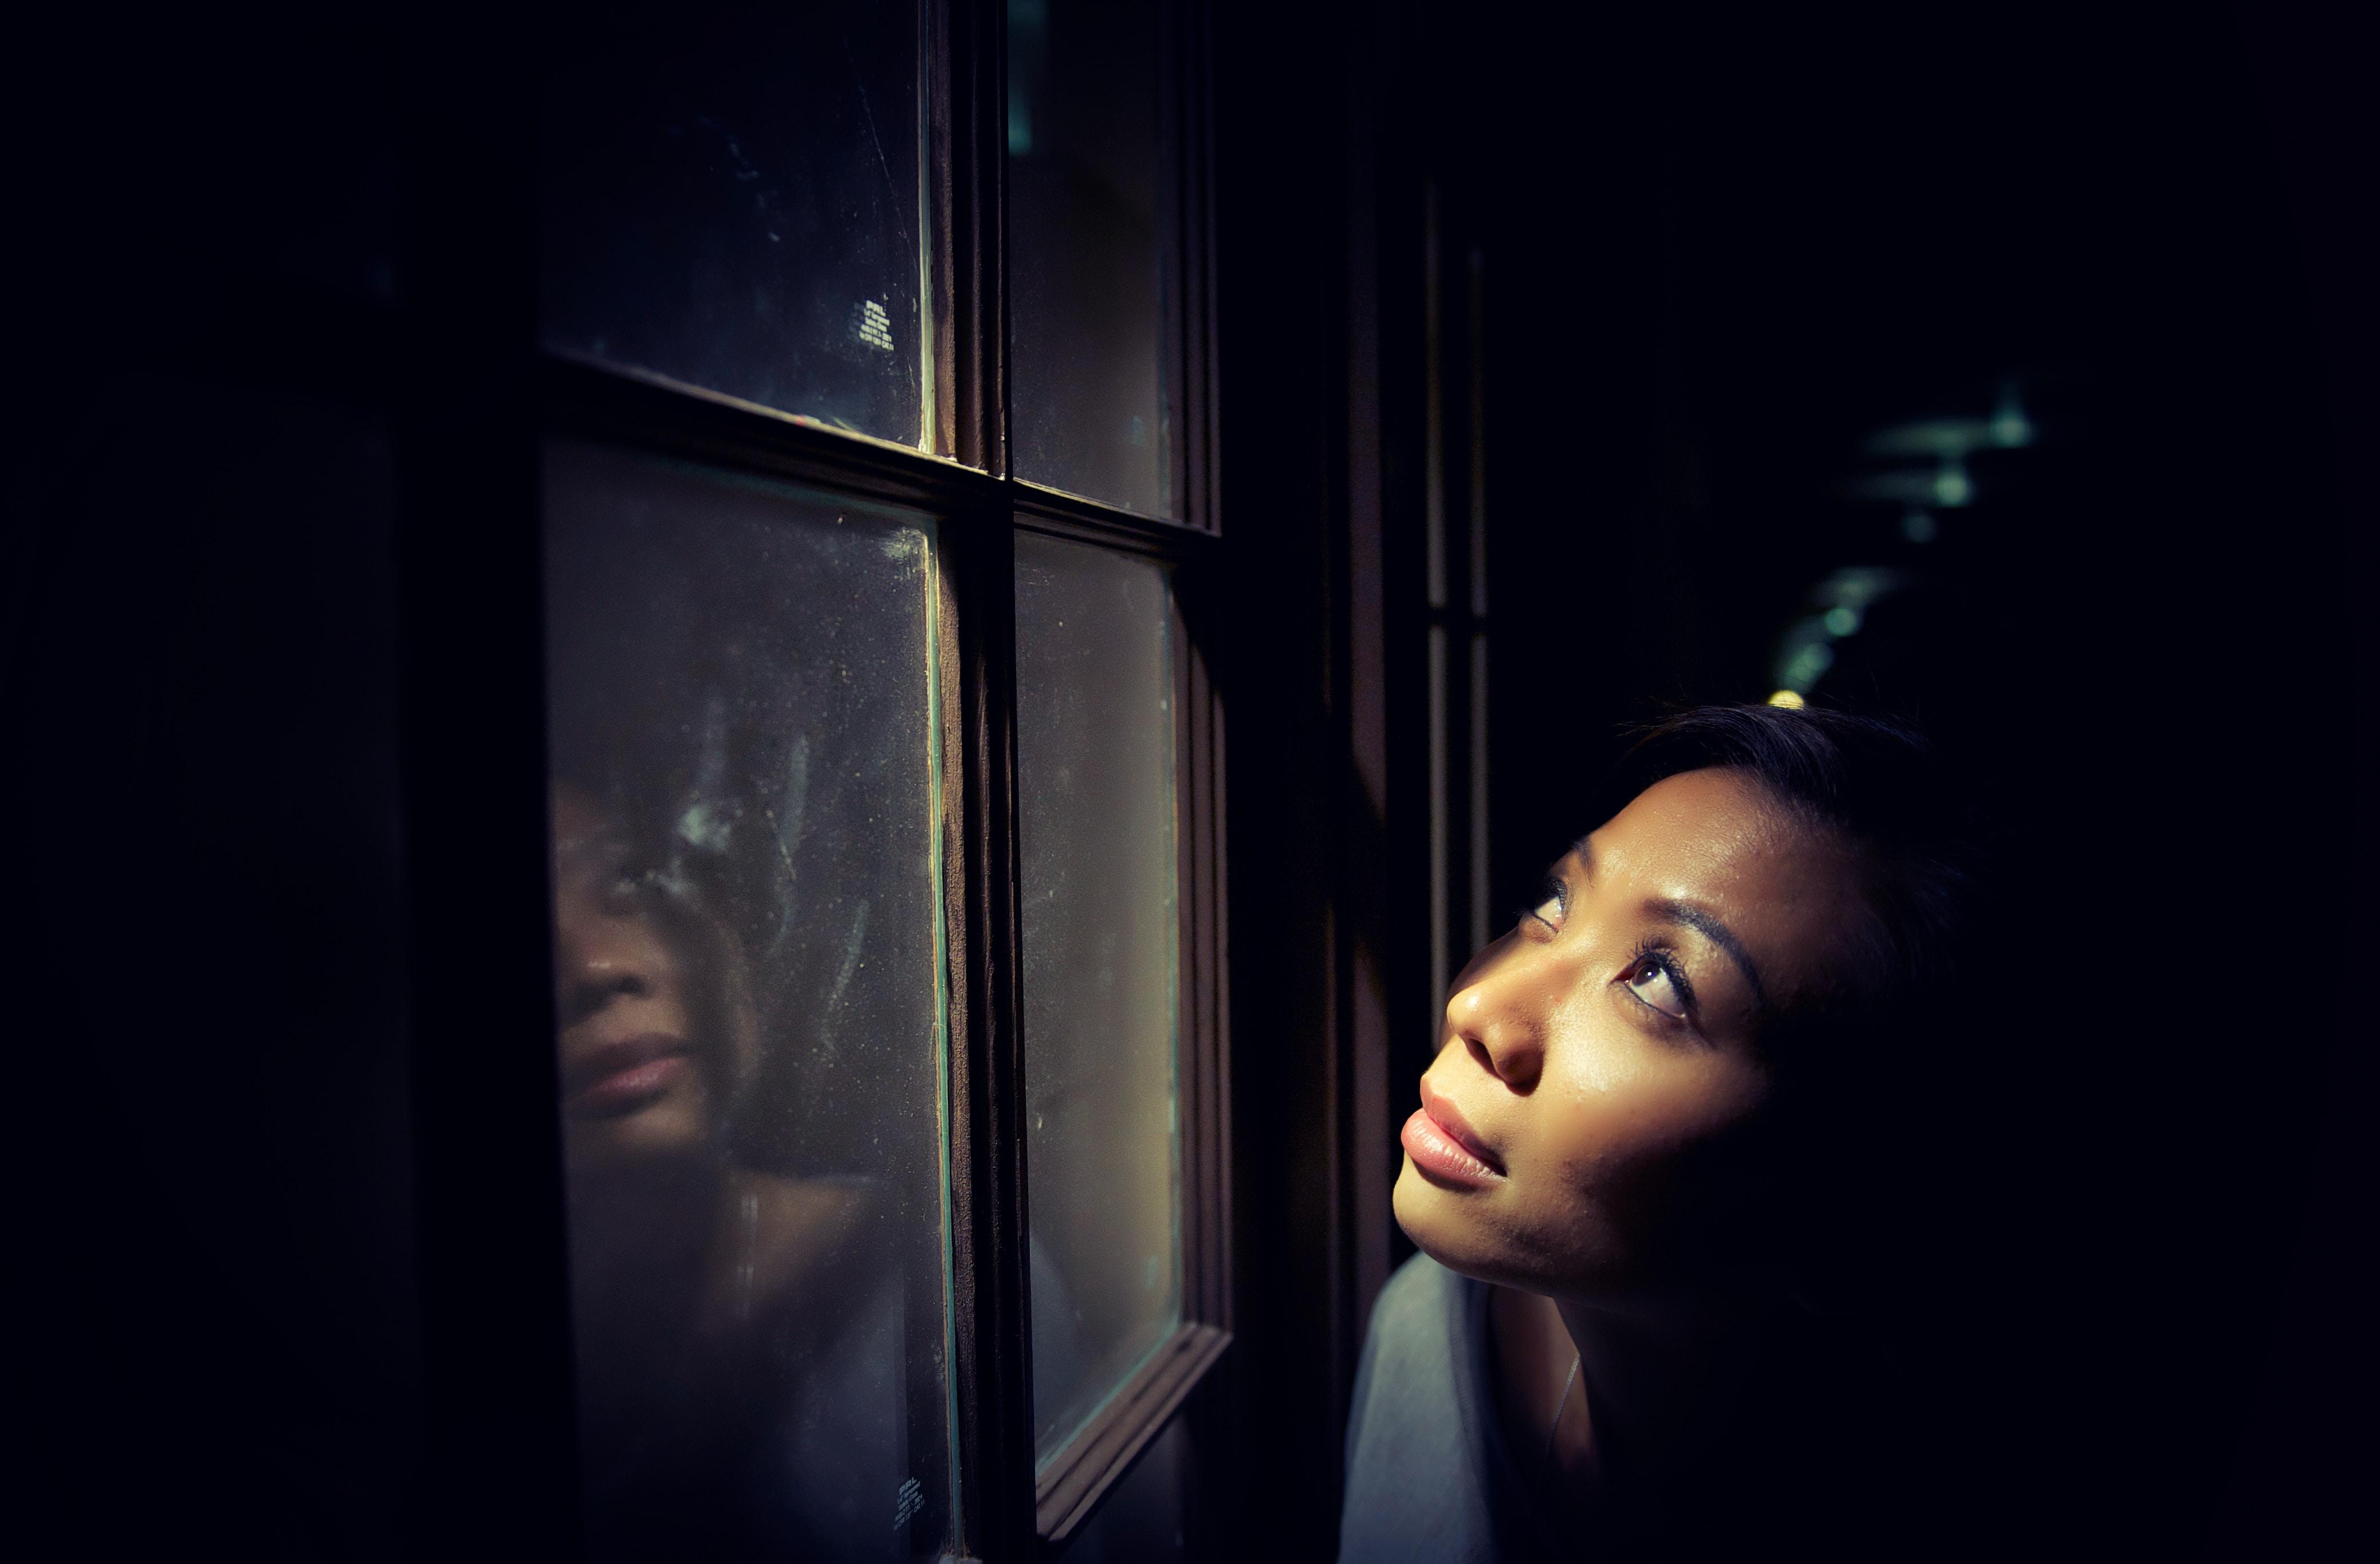 woman looking up behind window